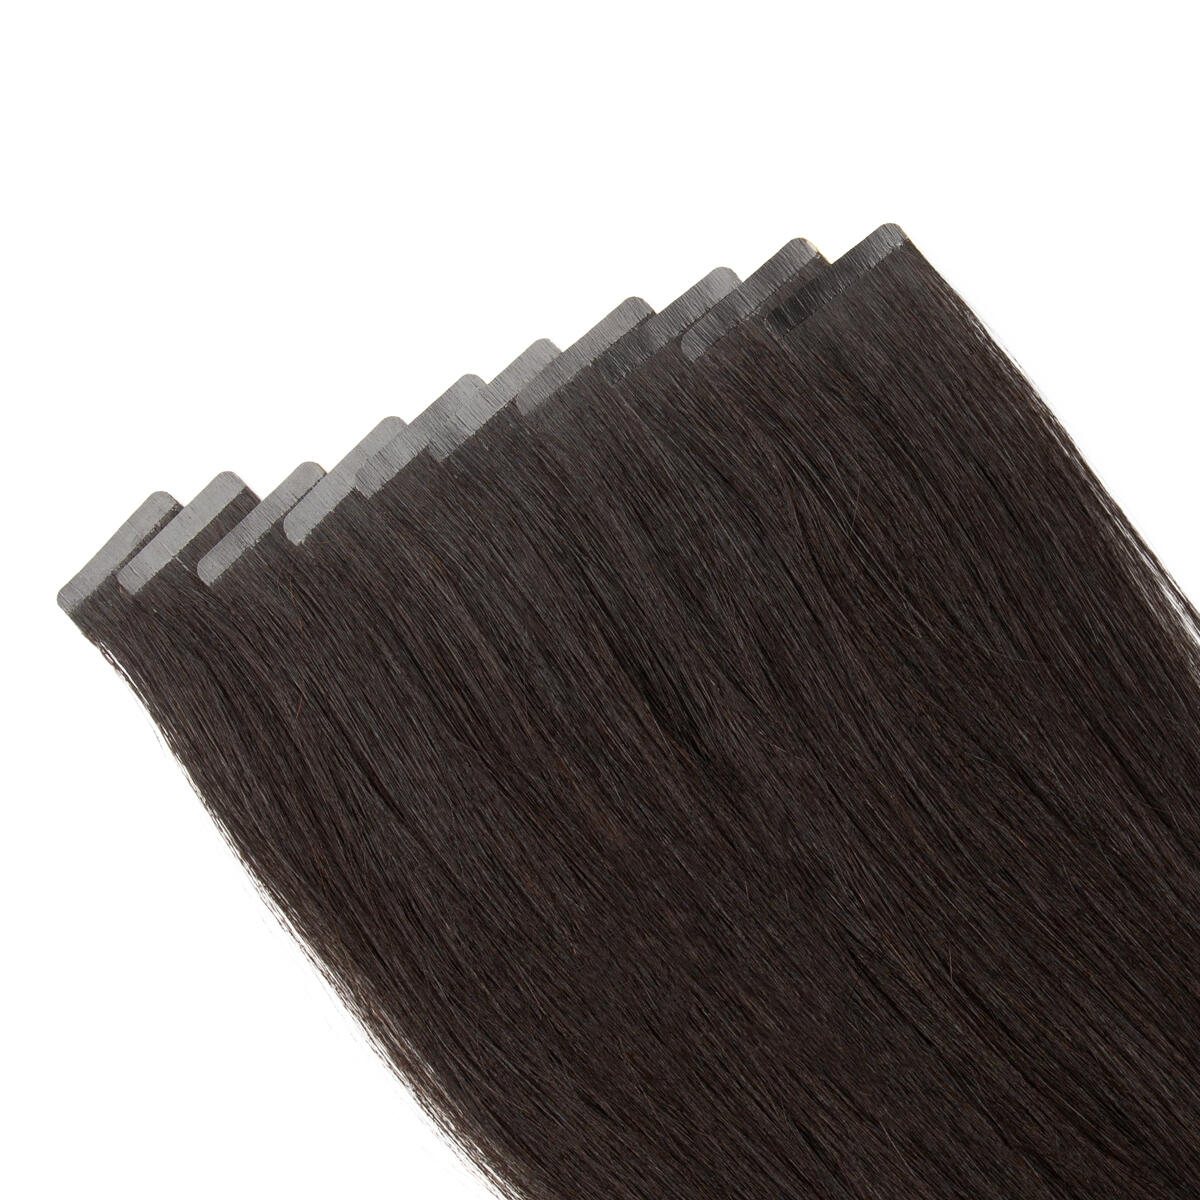 Rapunzel Sleek Tape Extension 1.2 Black Brown 25 cm